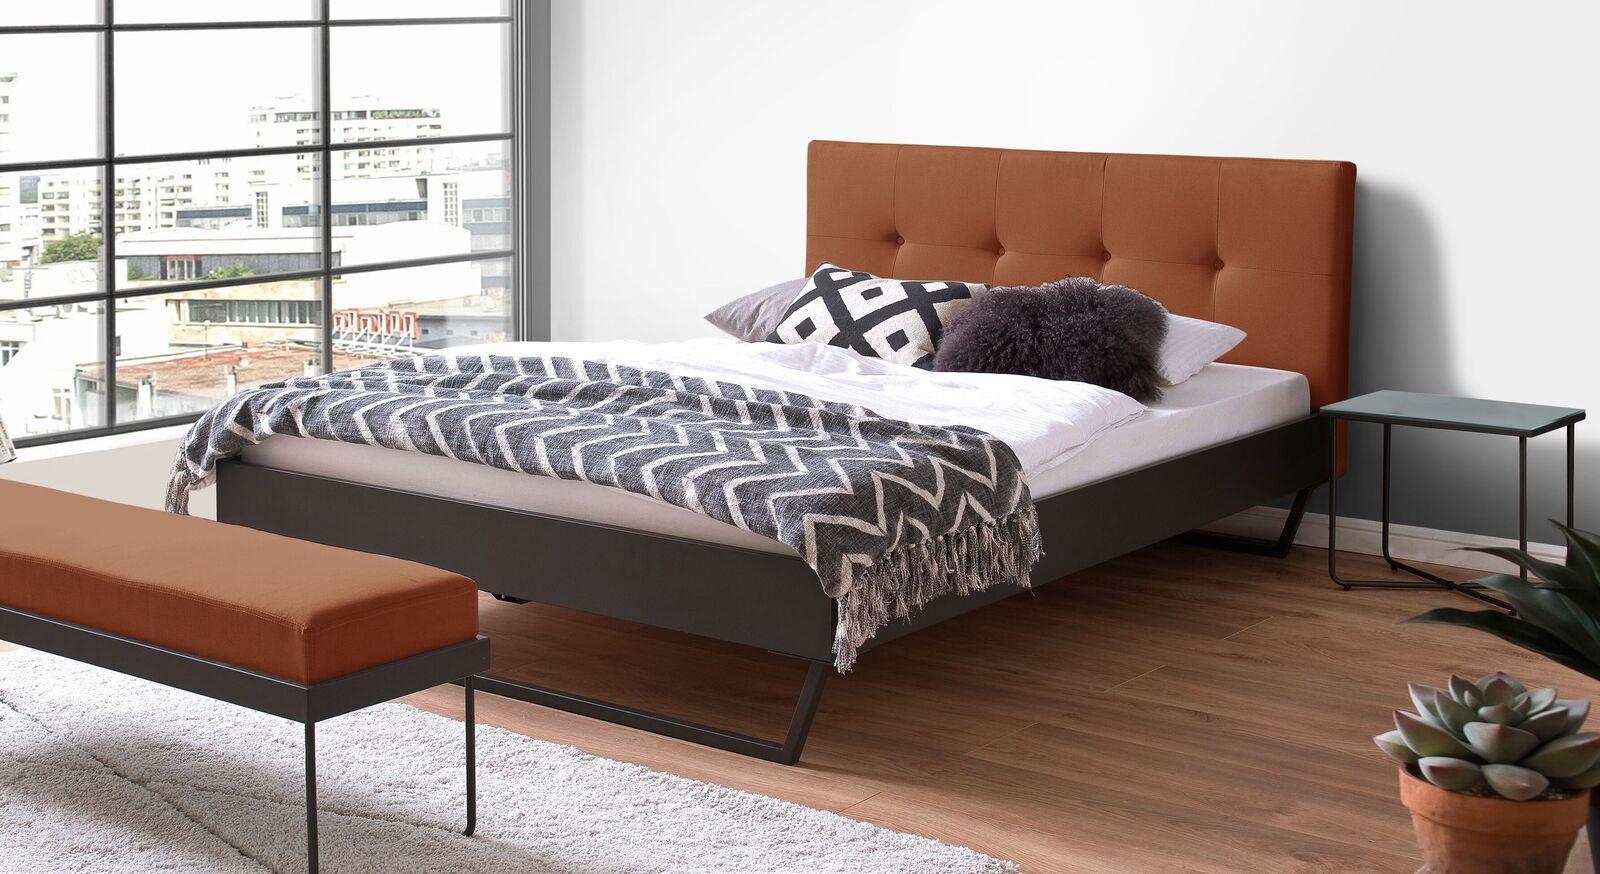 Modernes Bett Janka mit cognacfarbenem Kopfteil